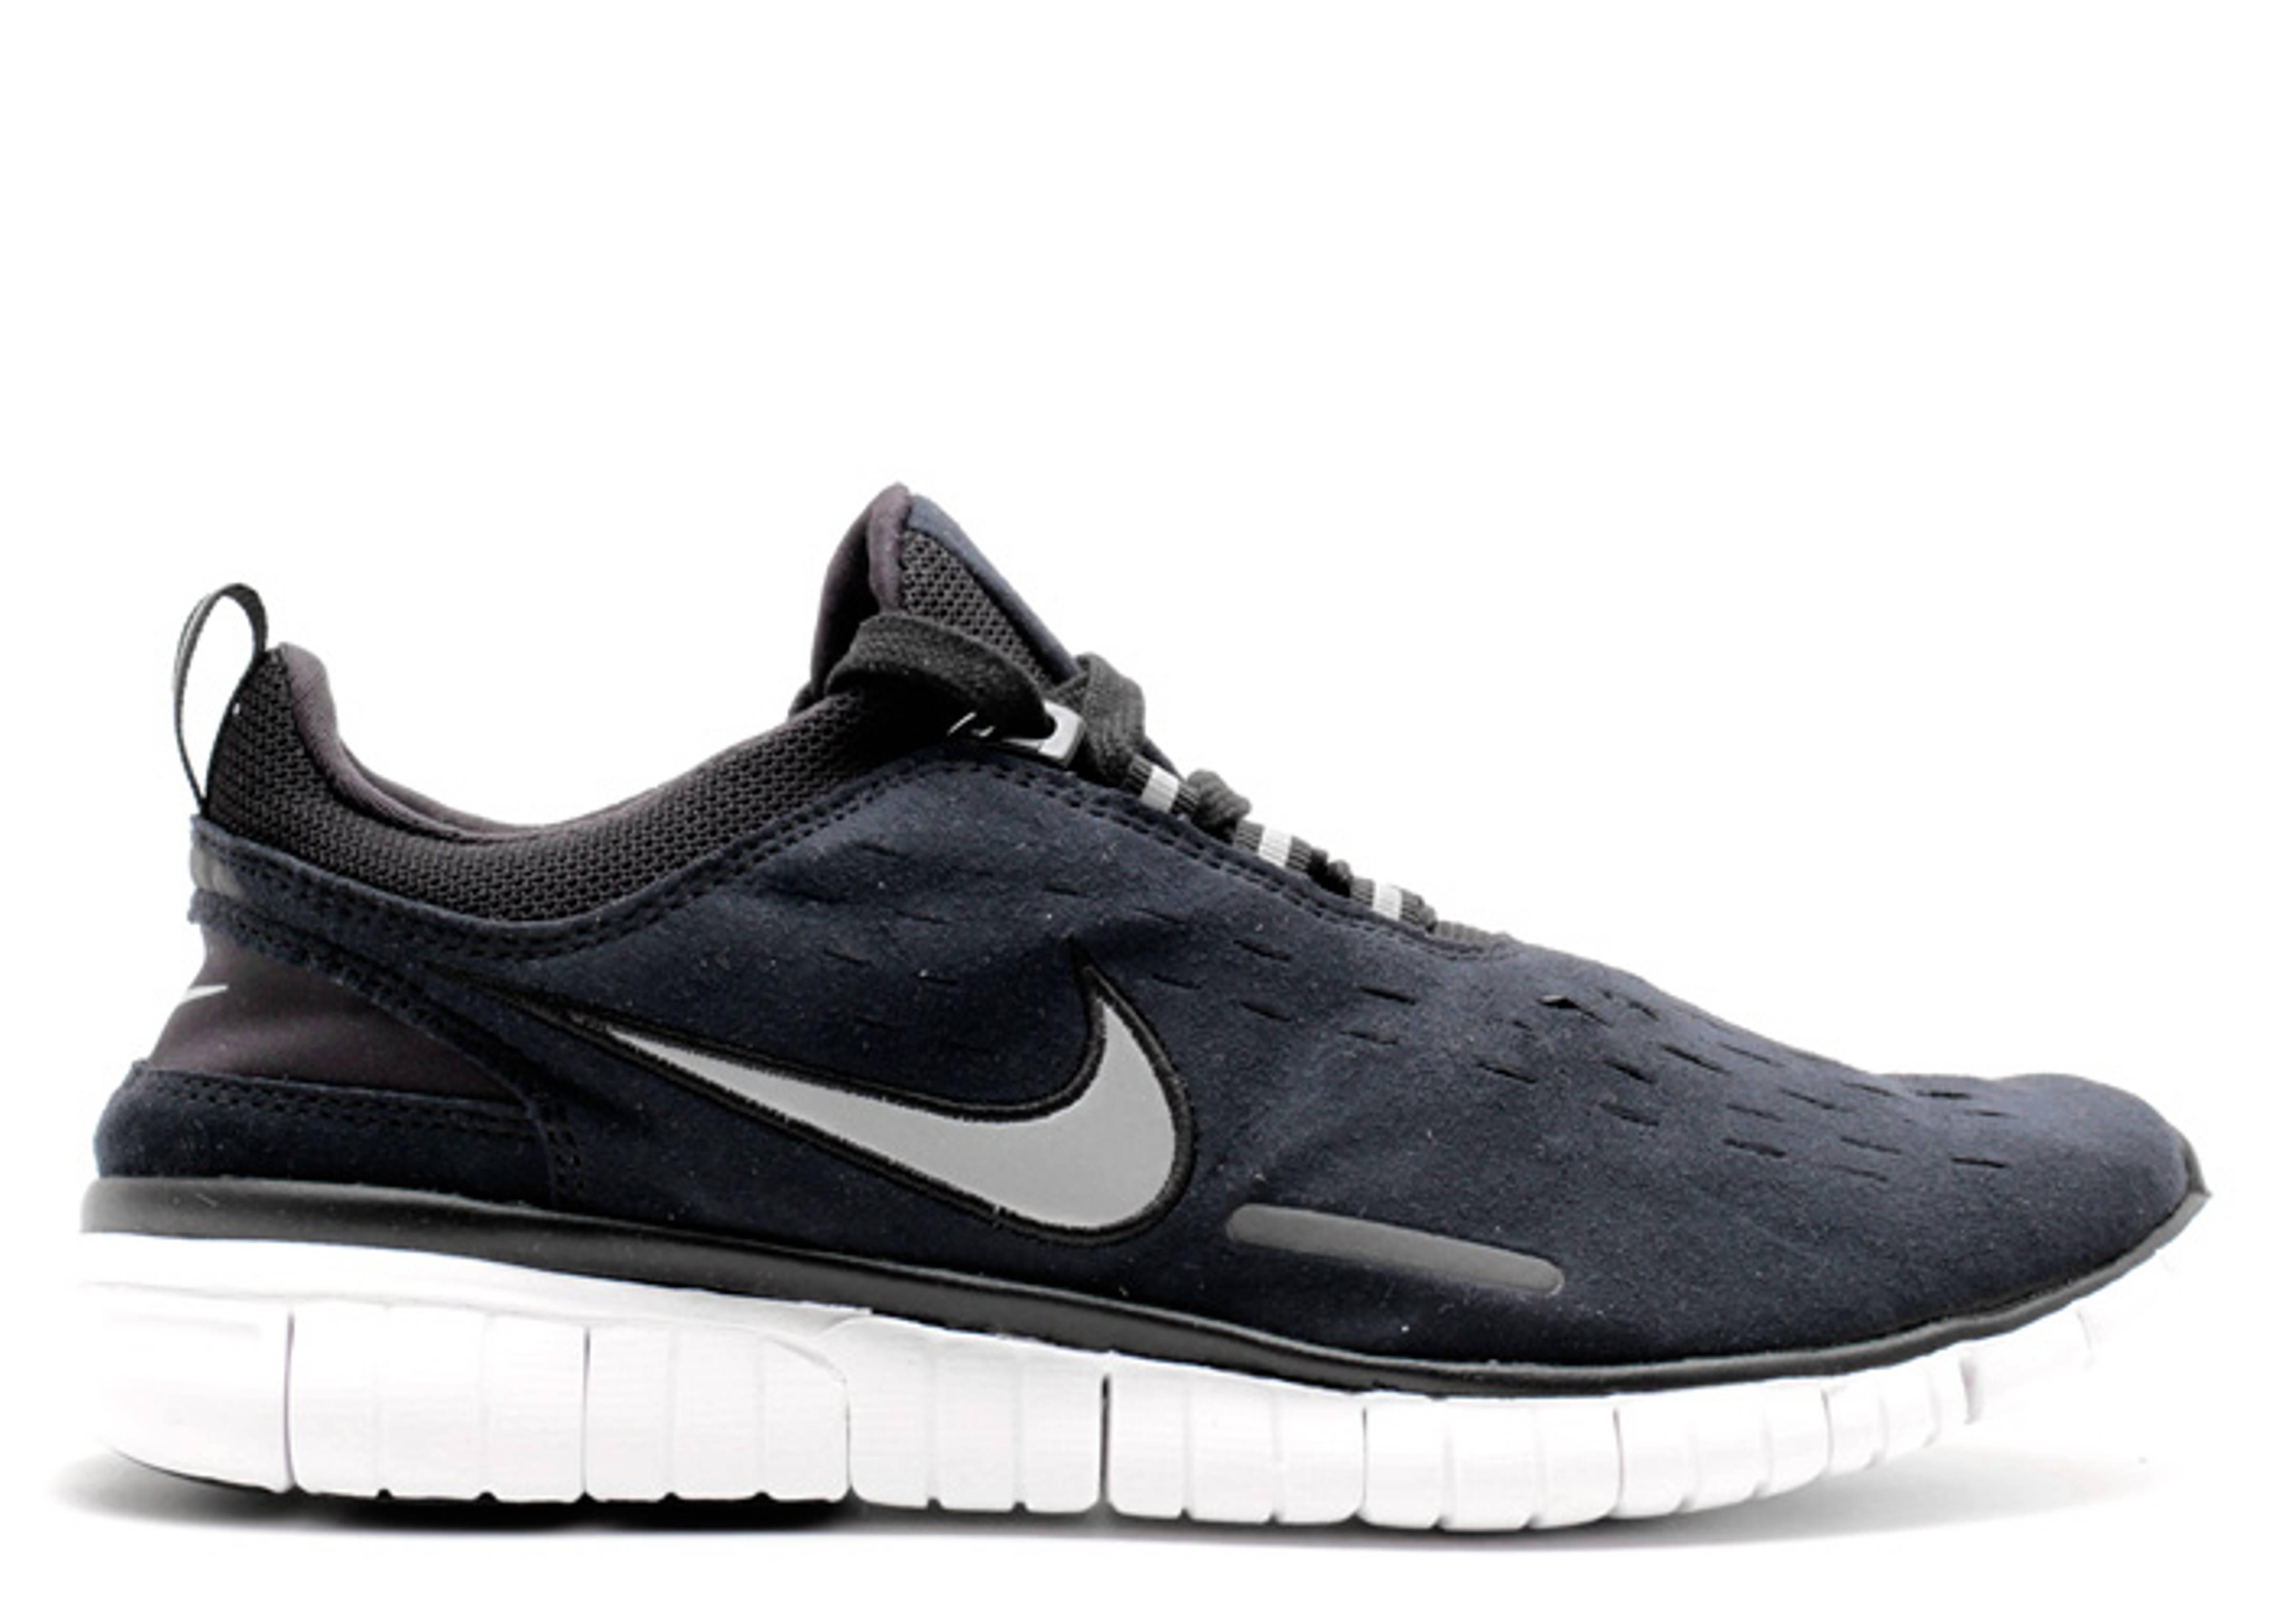 factory price d5bf6 5f6d0 Free Og 14 Apc Sp - Nike - 705534 091 - blackreflect silver-white  Flight  Club